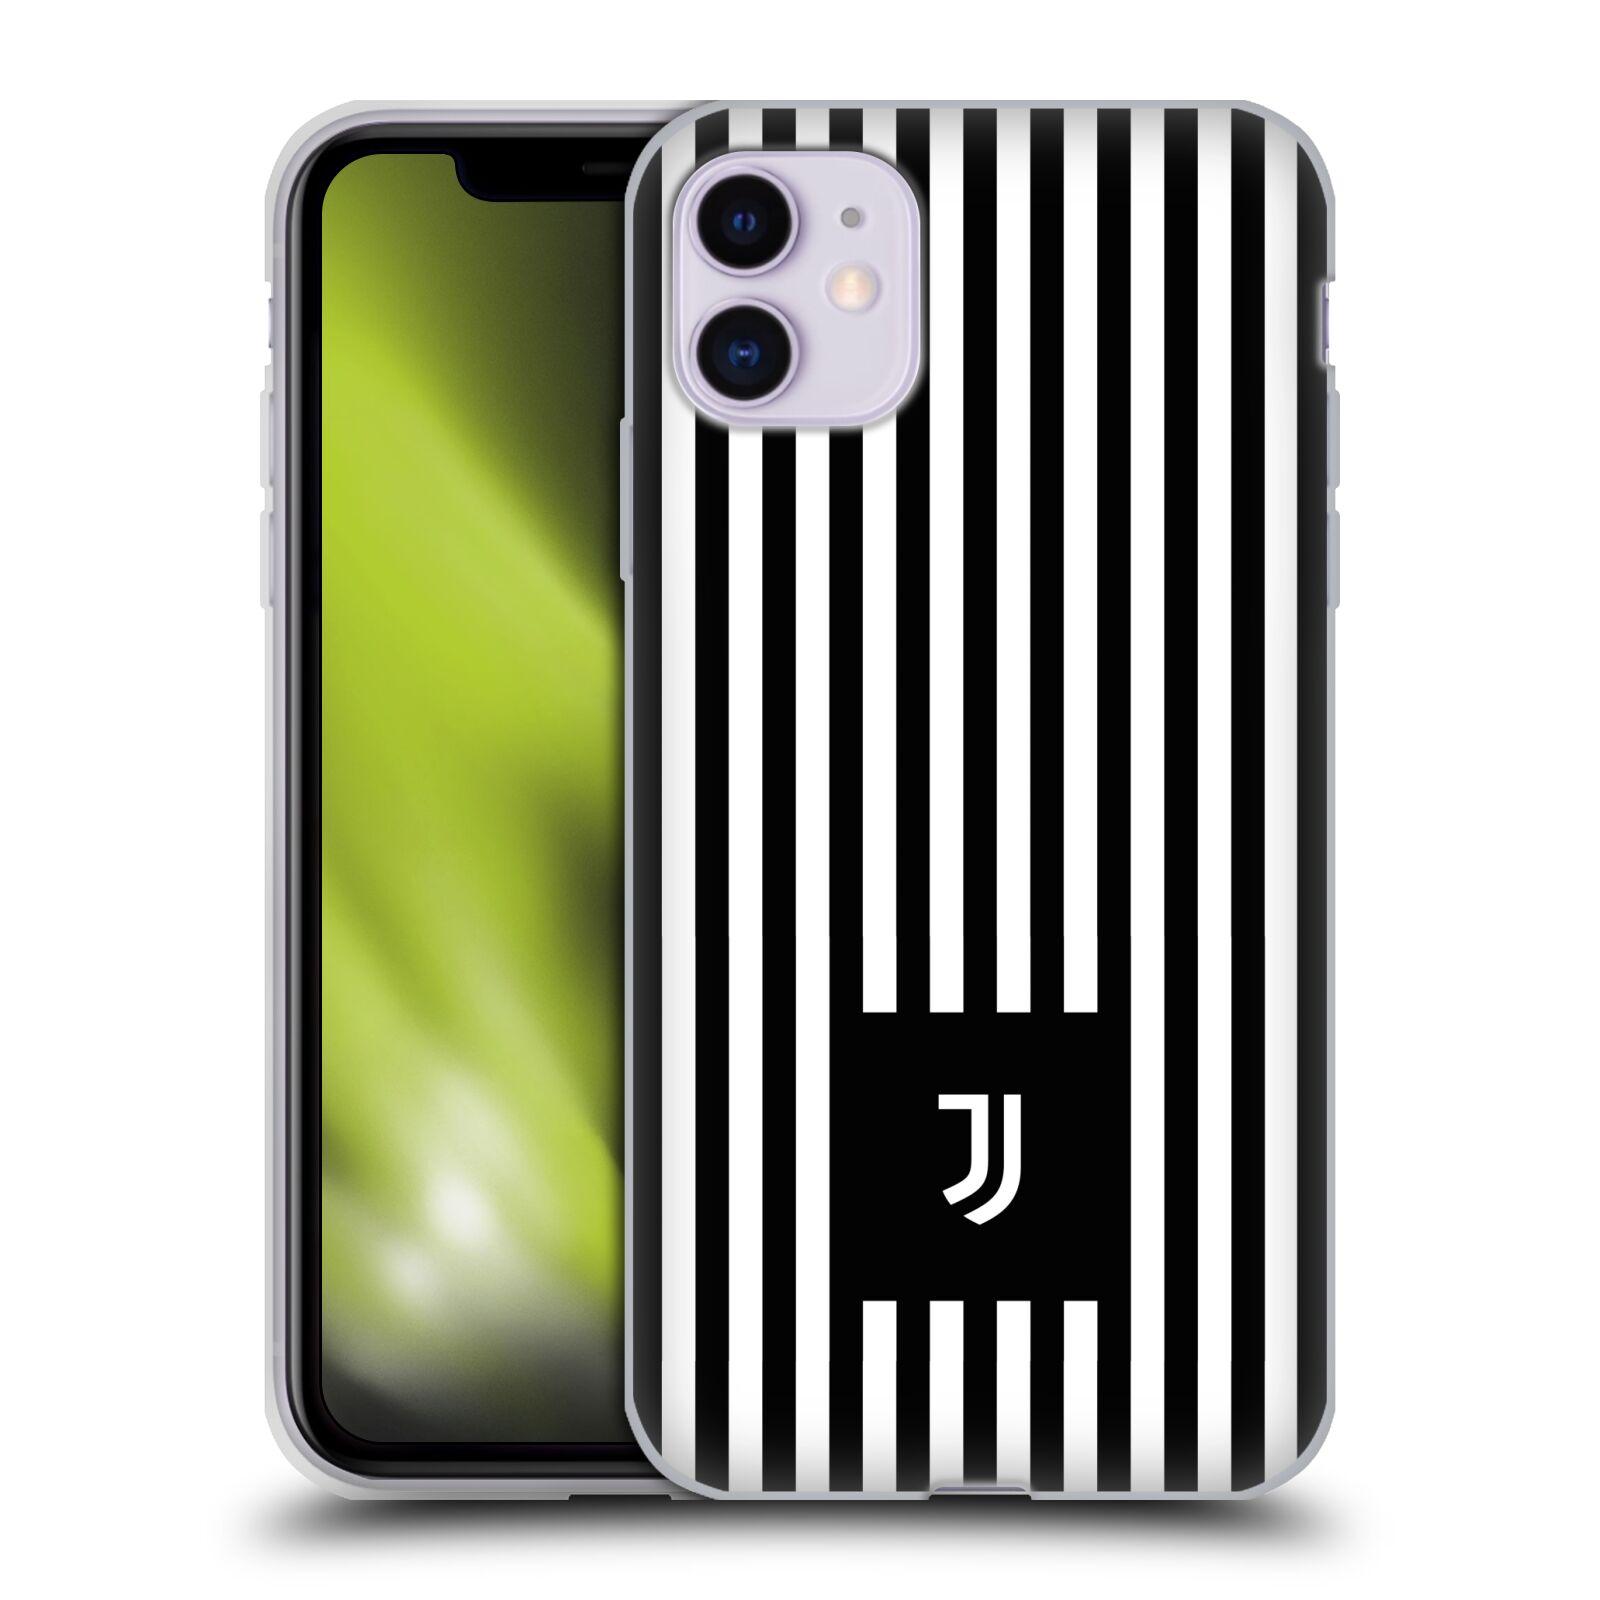 Silikonové pouzdro na mobil Apple iPhone 11 - Head Case - Juventus FC - Nové logo - Pruhy